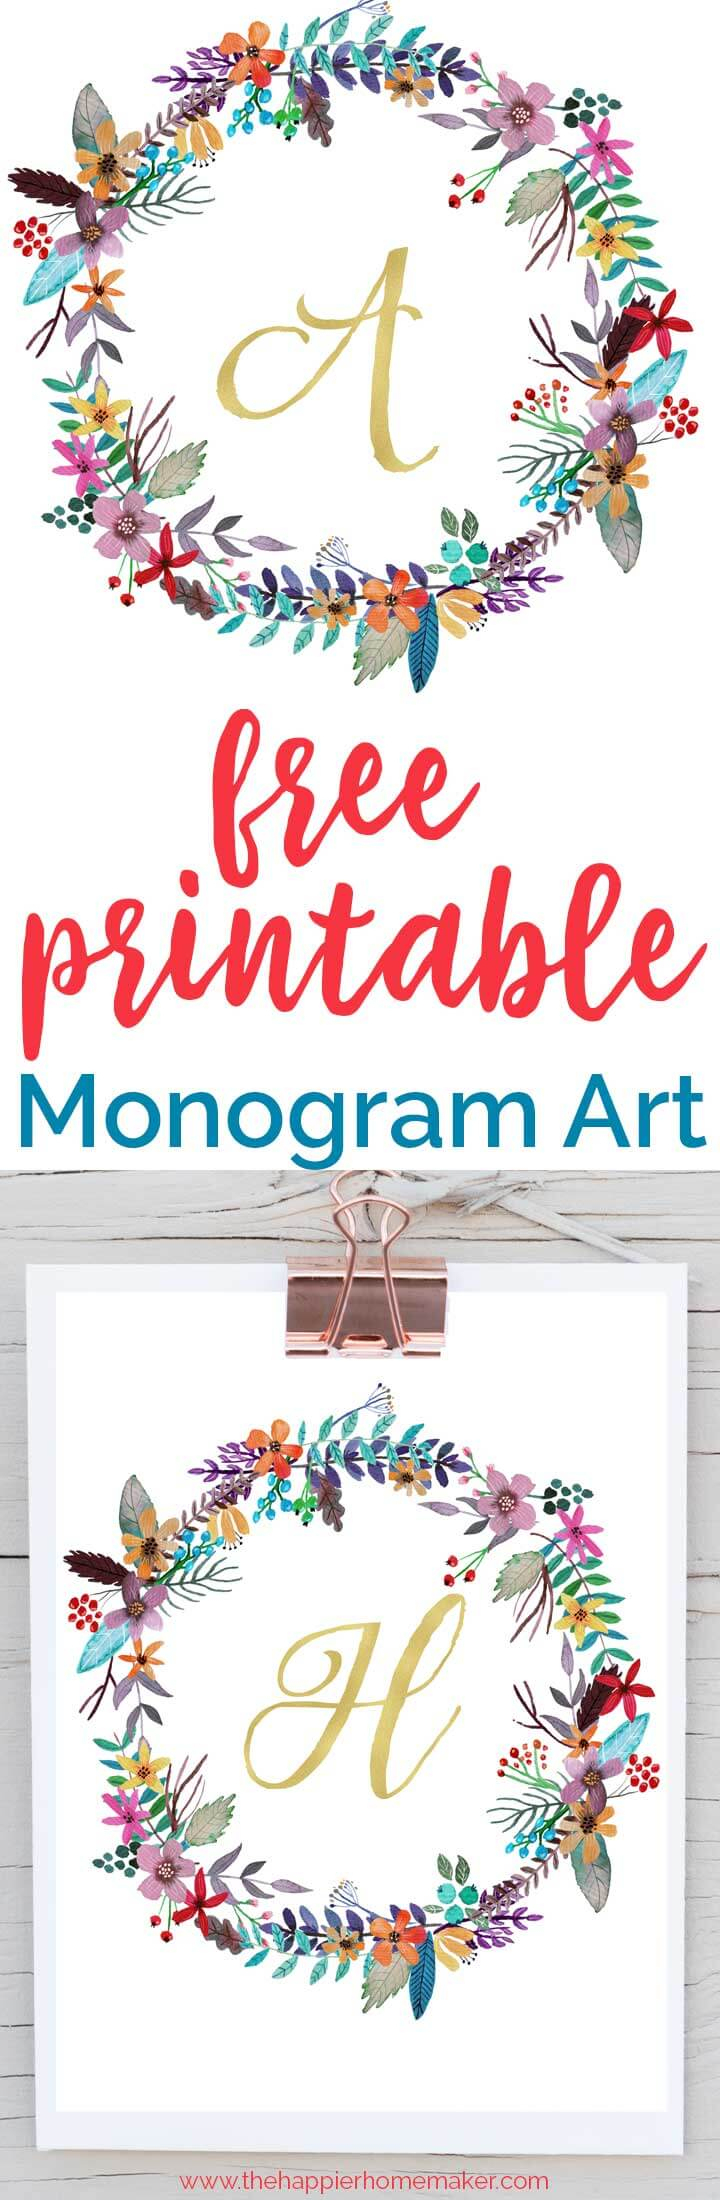 Free Printable Monogram Art   The Happier Homemaker - Free Printable Monogram